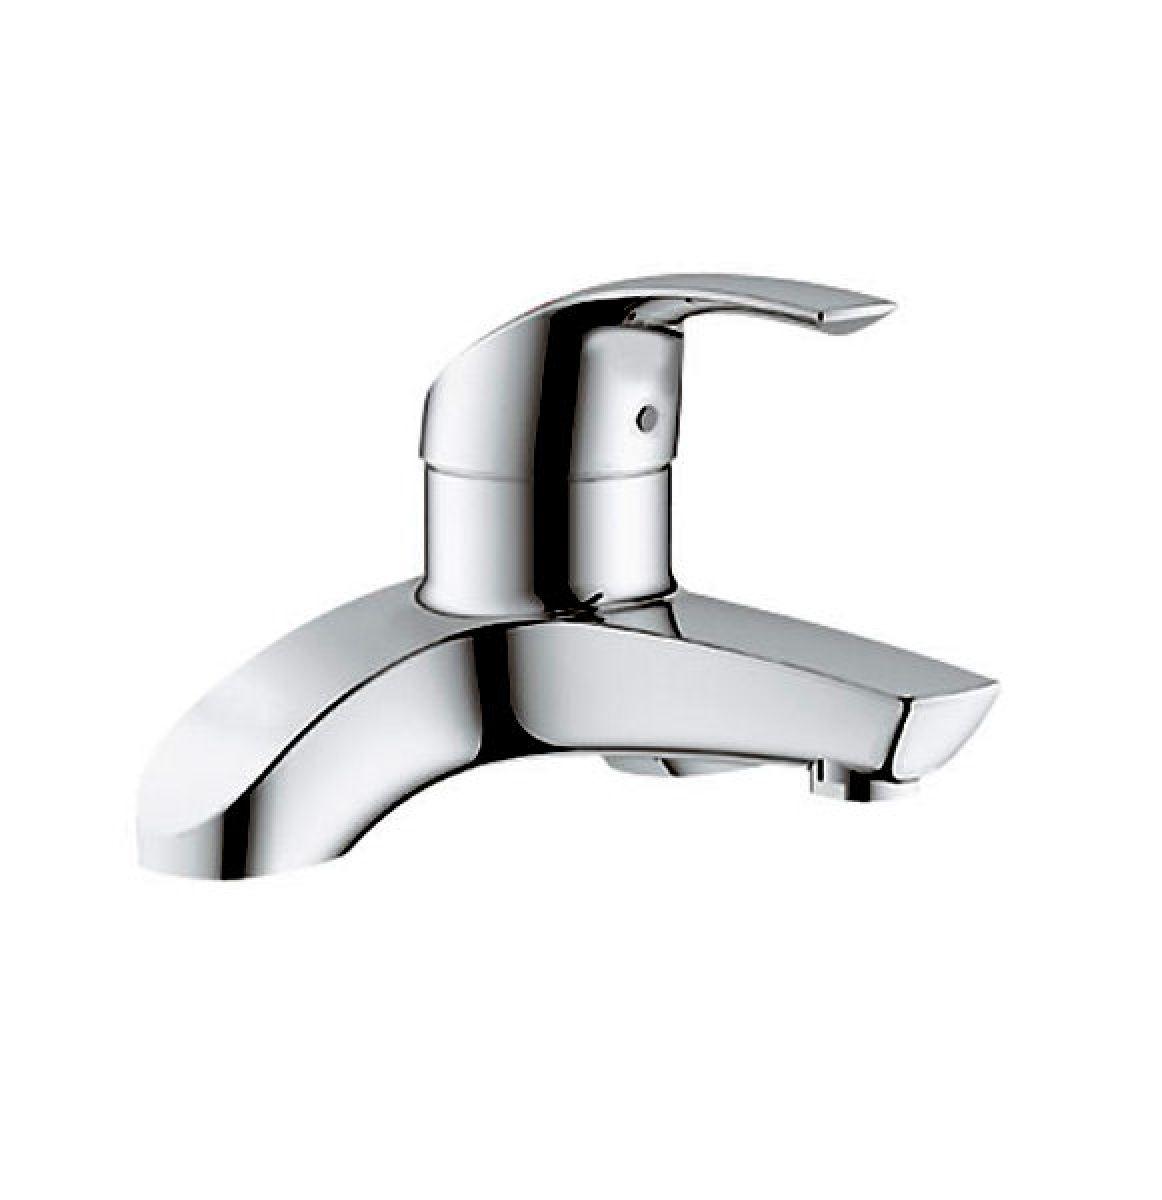 Grohe Eurosmart Basin Mixer and Bath Filler : UK Bathrooms